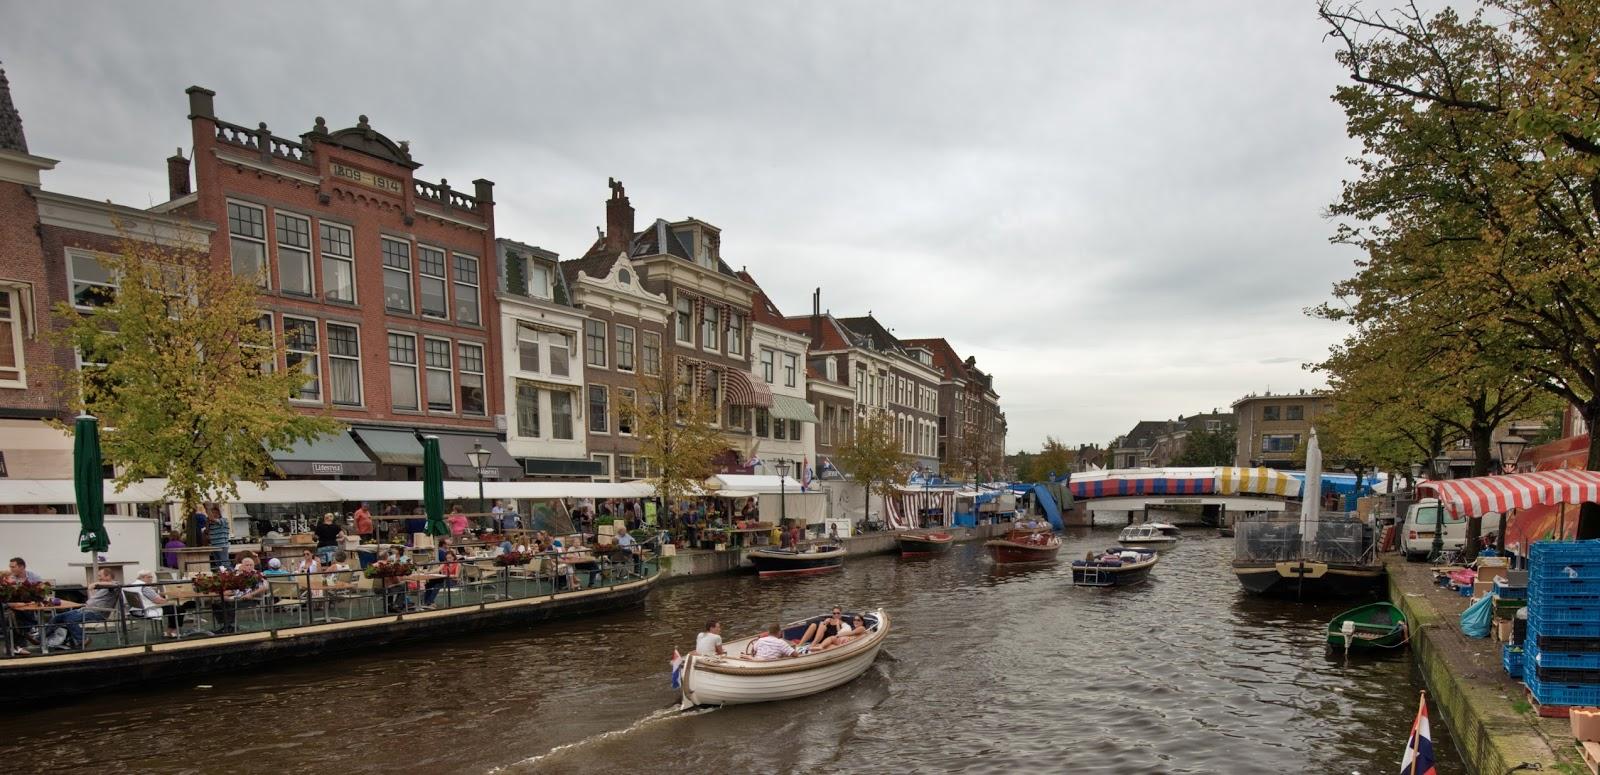 A boat trip by river in Leiden